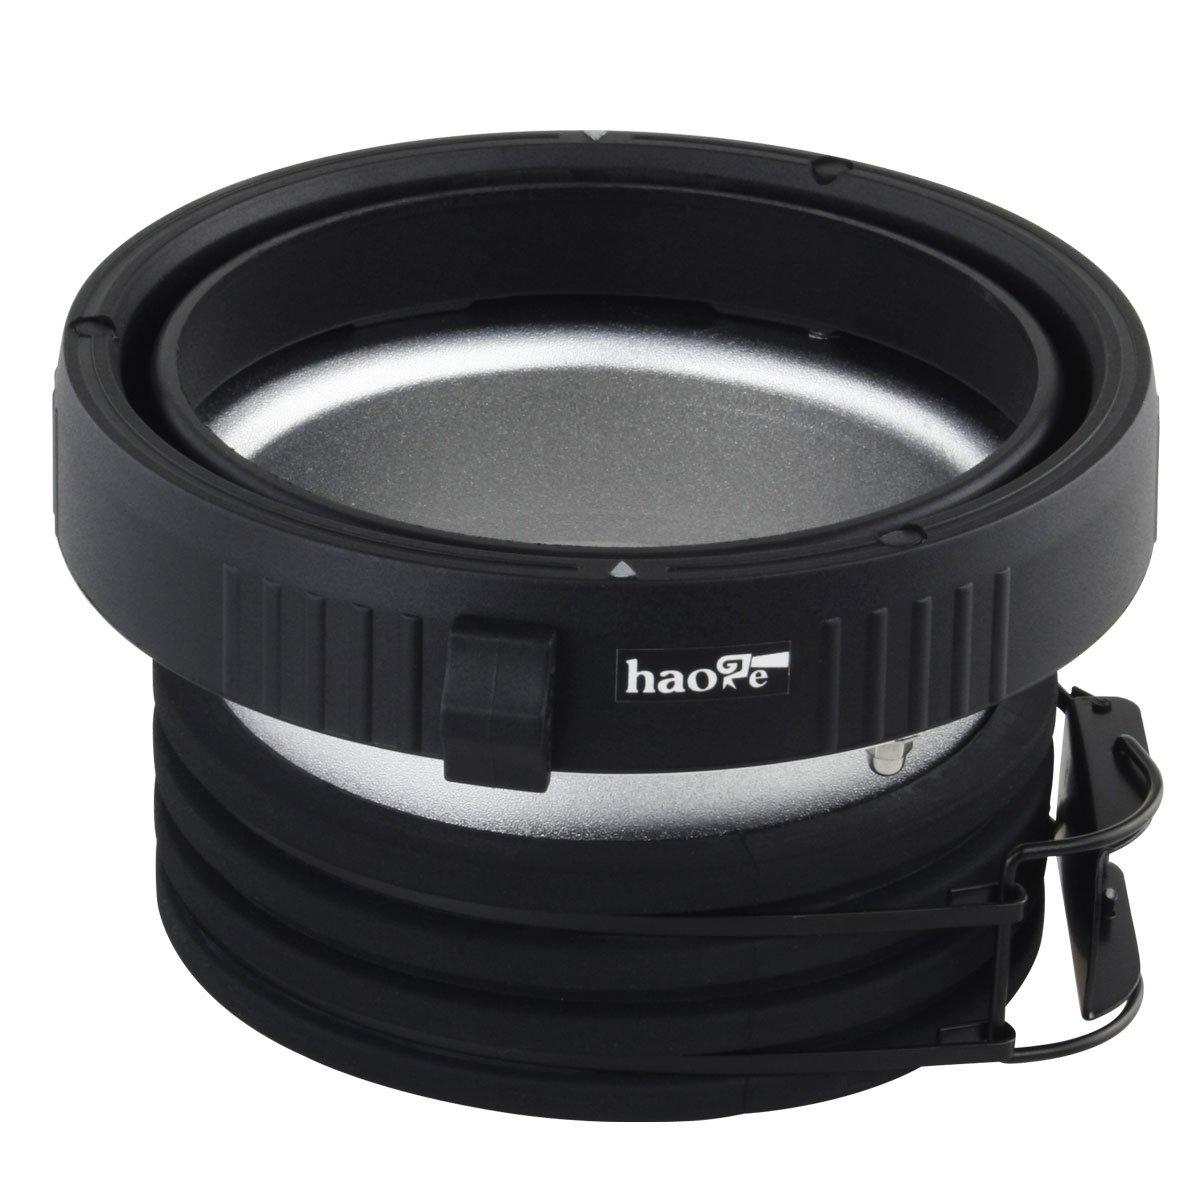 Haoge Profoto to Elinchrom Mount Speedring Ring Adapter Converter for Studio Light Strobe Flash Monolight by Haoge